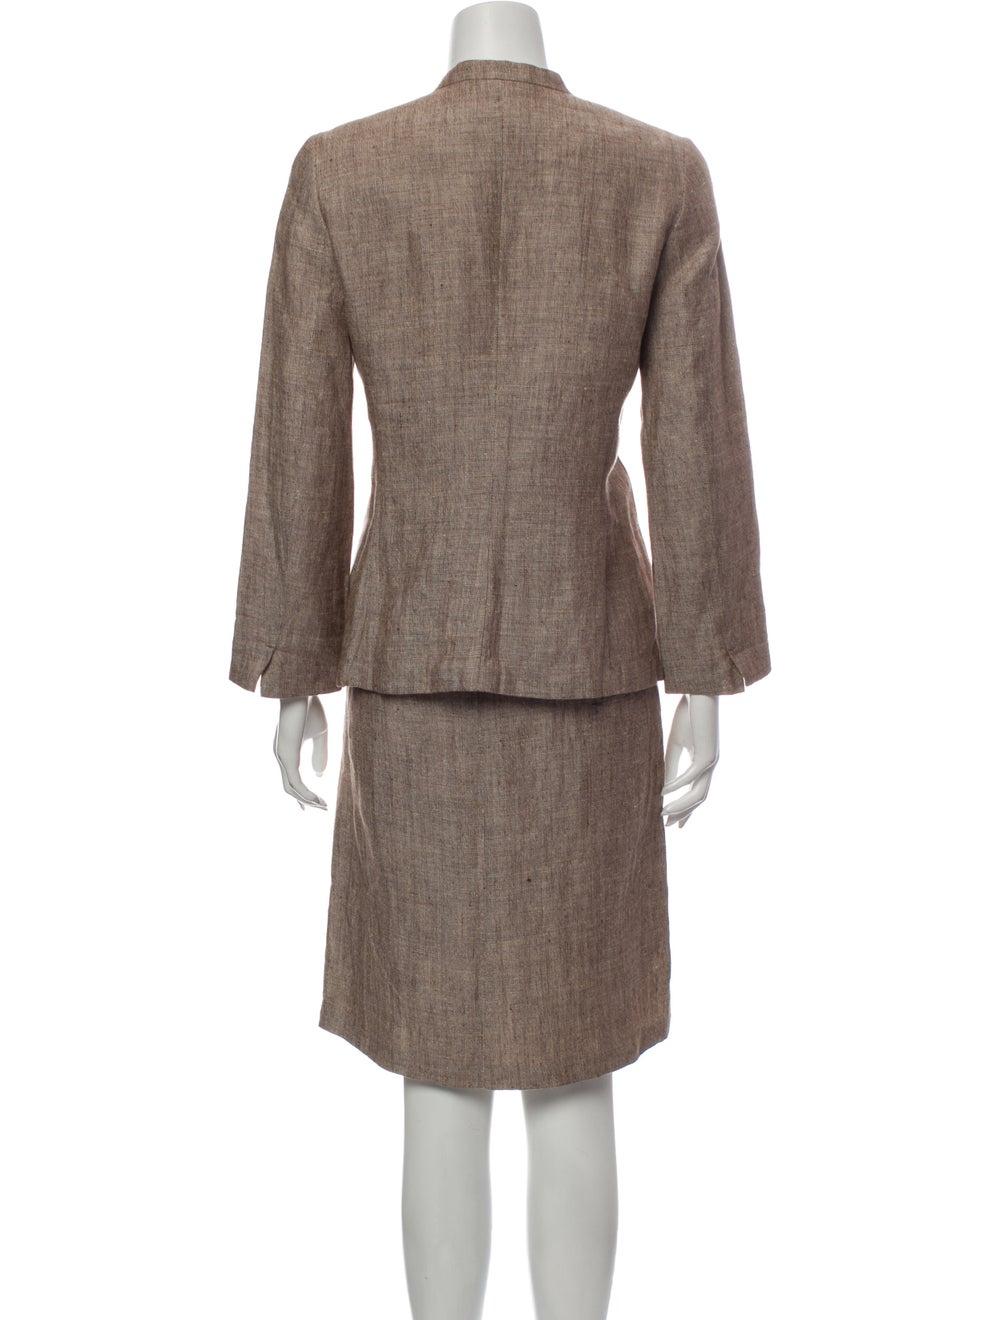 Burberry London Linen Skirt Suit - image 3